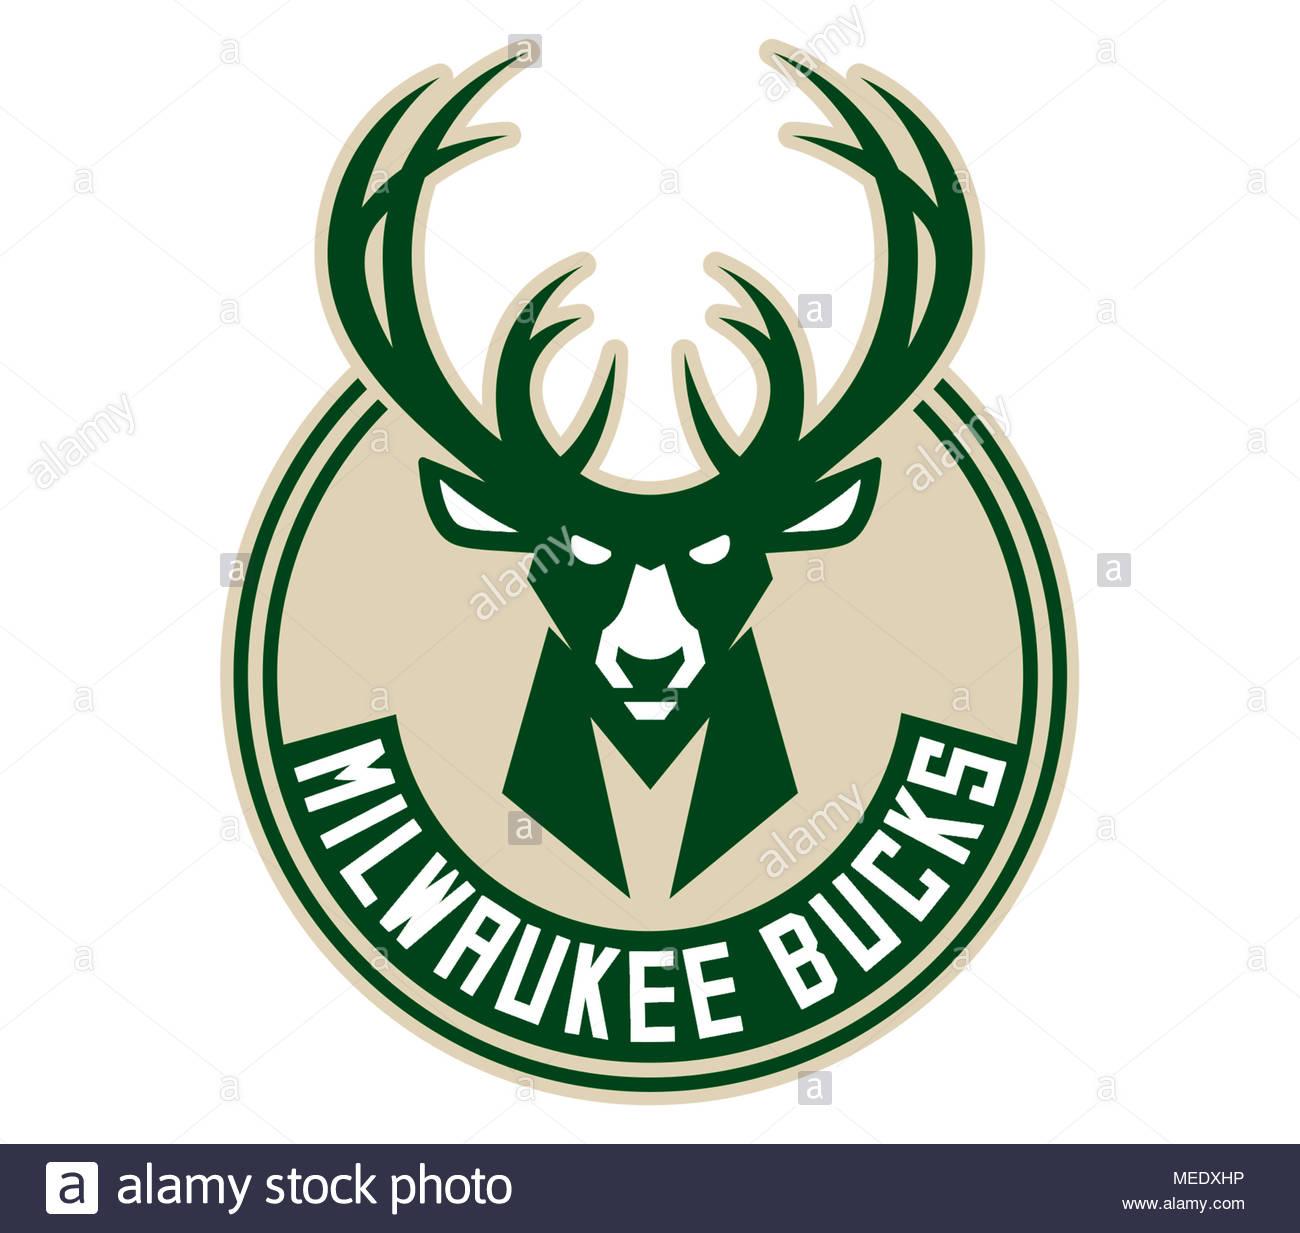 Milwaukee Bucks icon logo - Stock Image